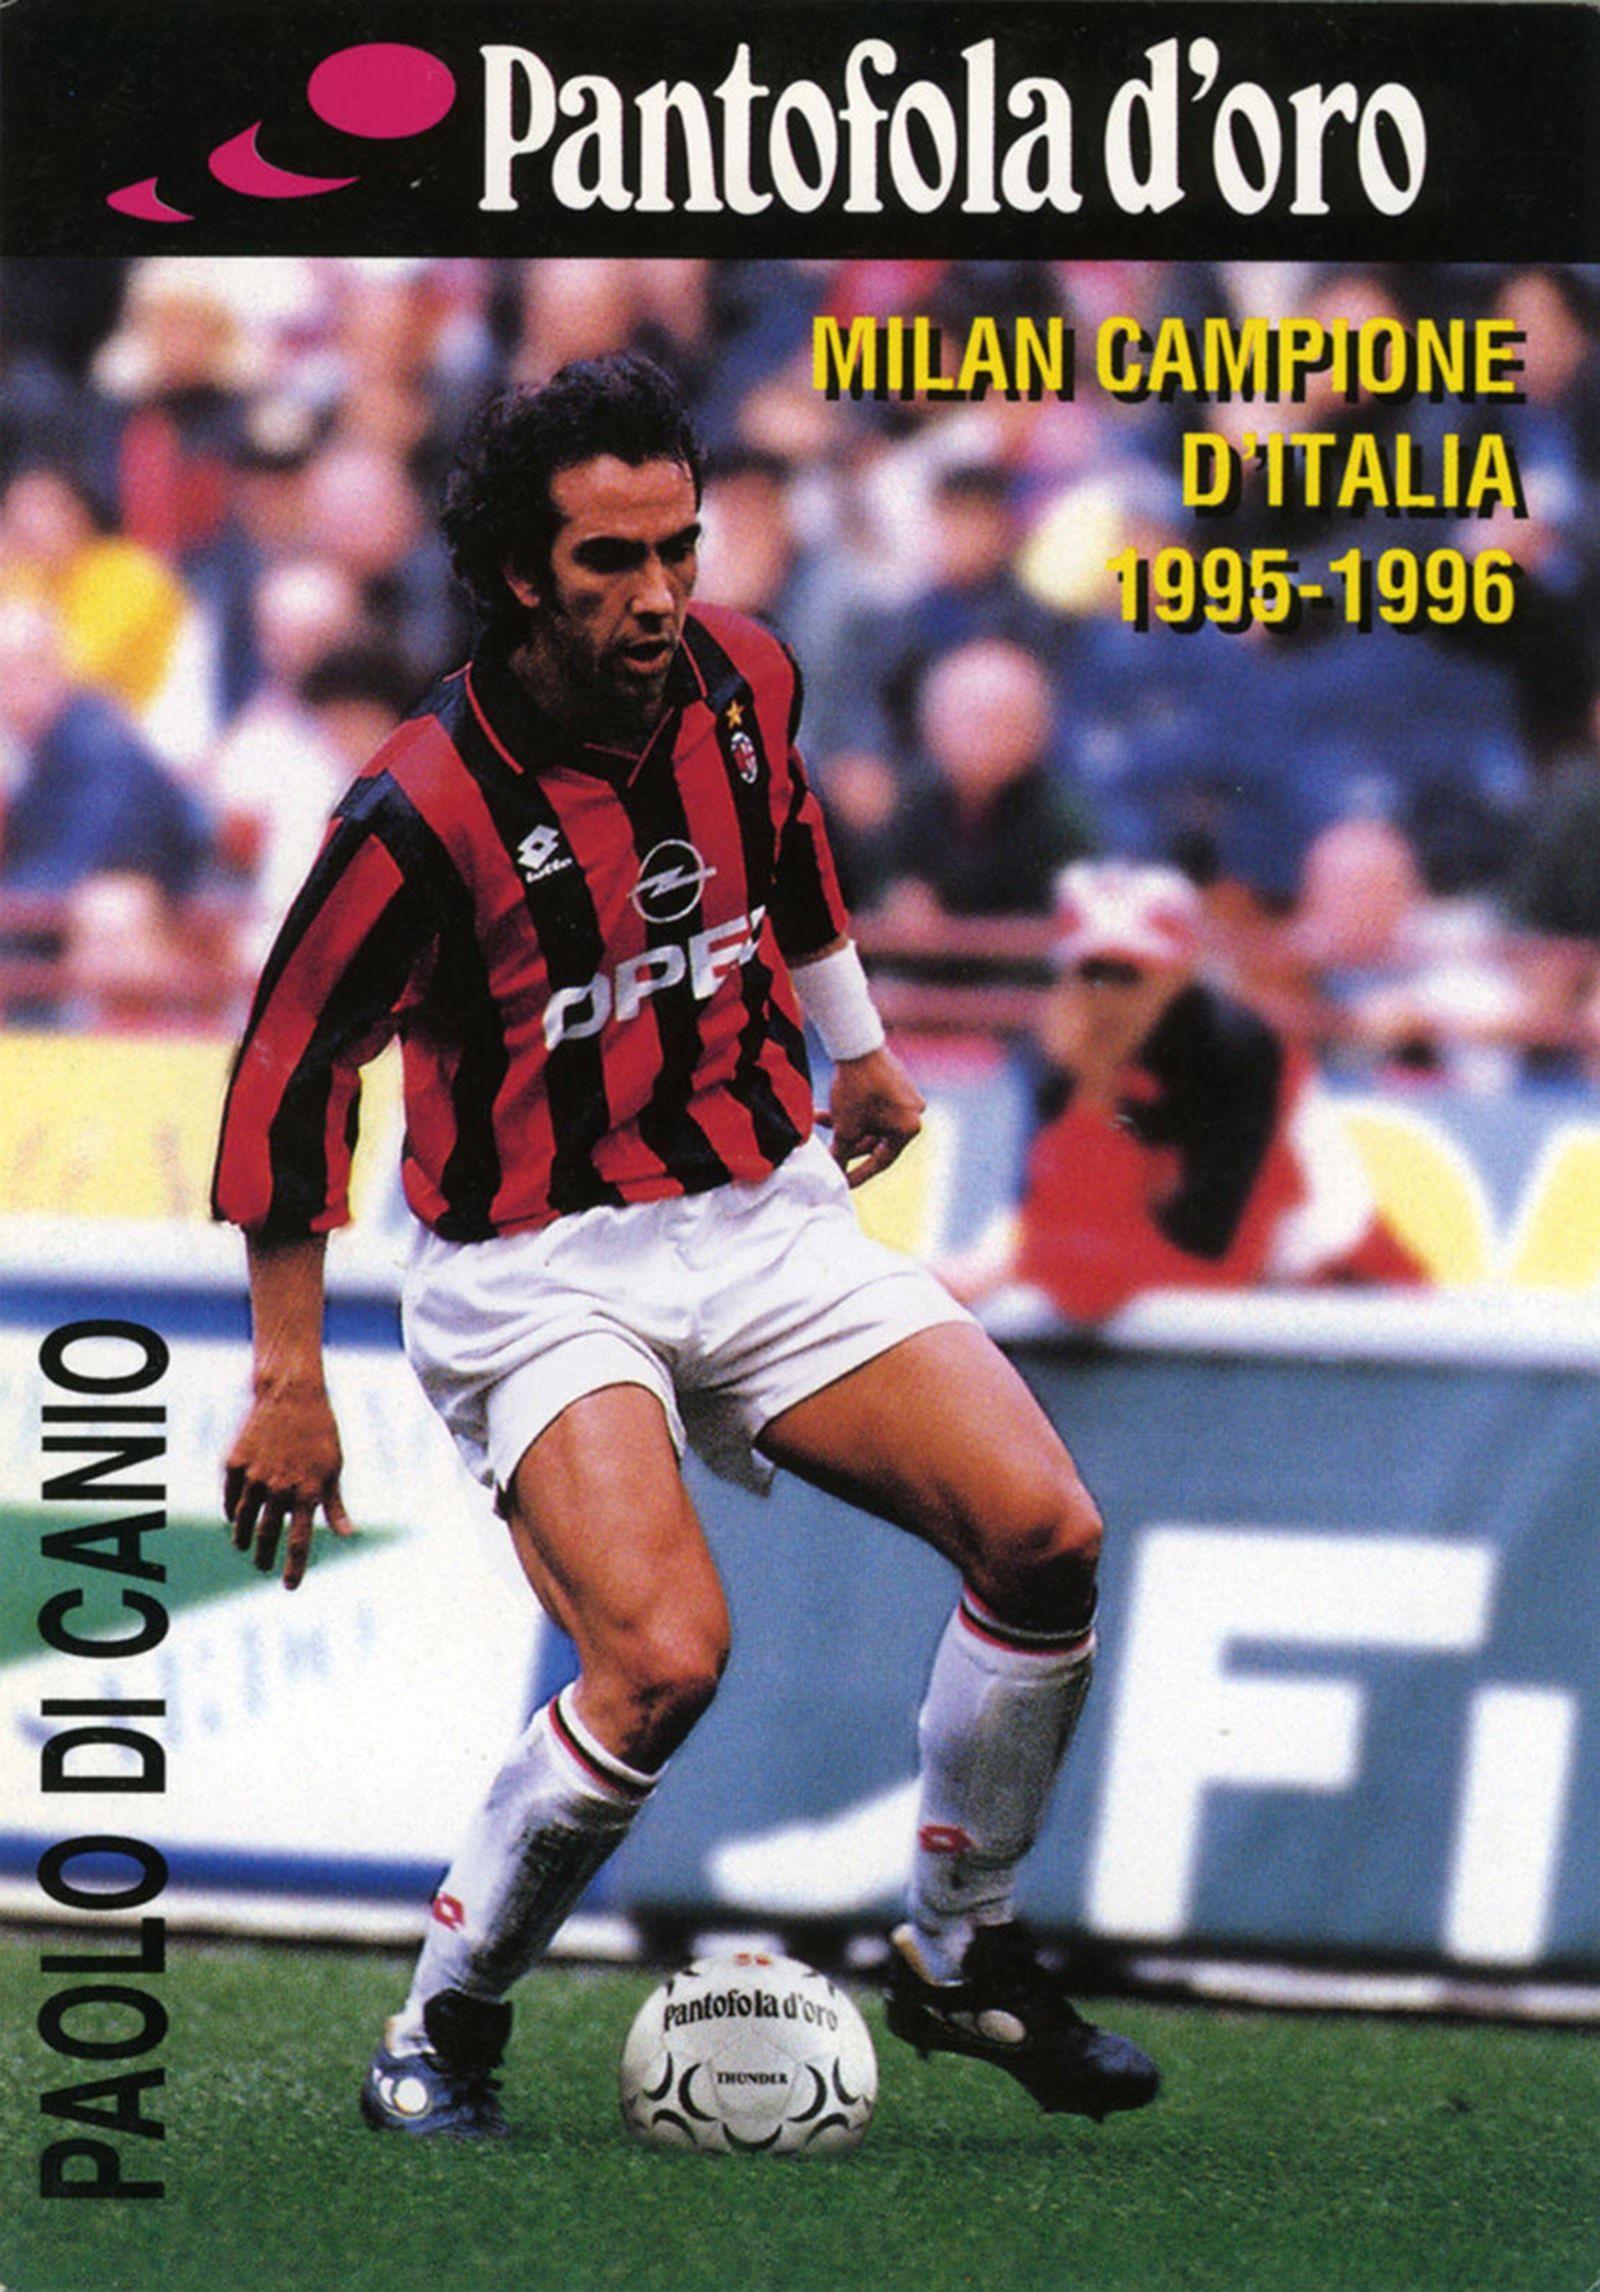 best-football-boots-pantafola-doro-dicanio